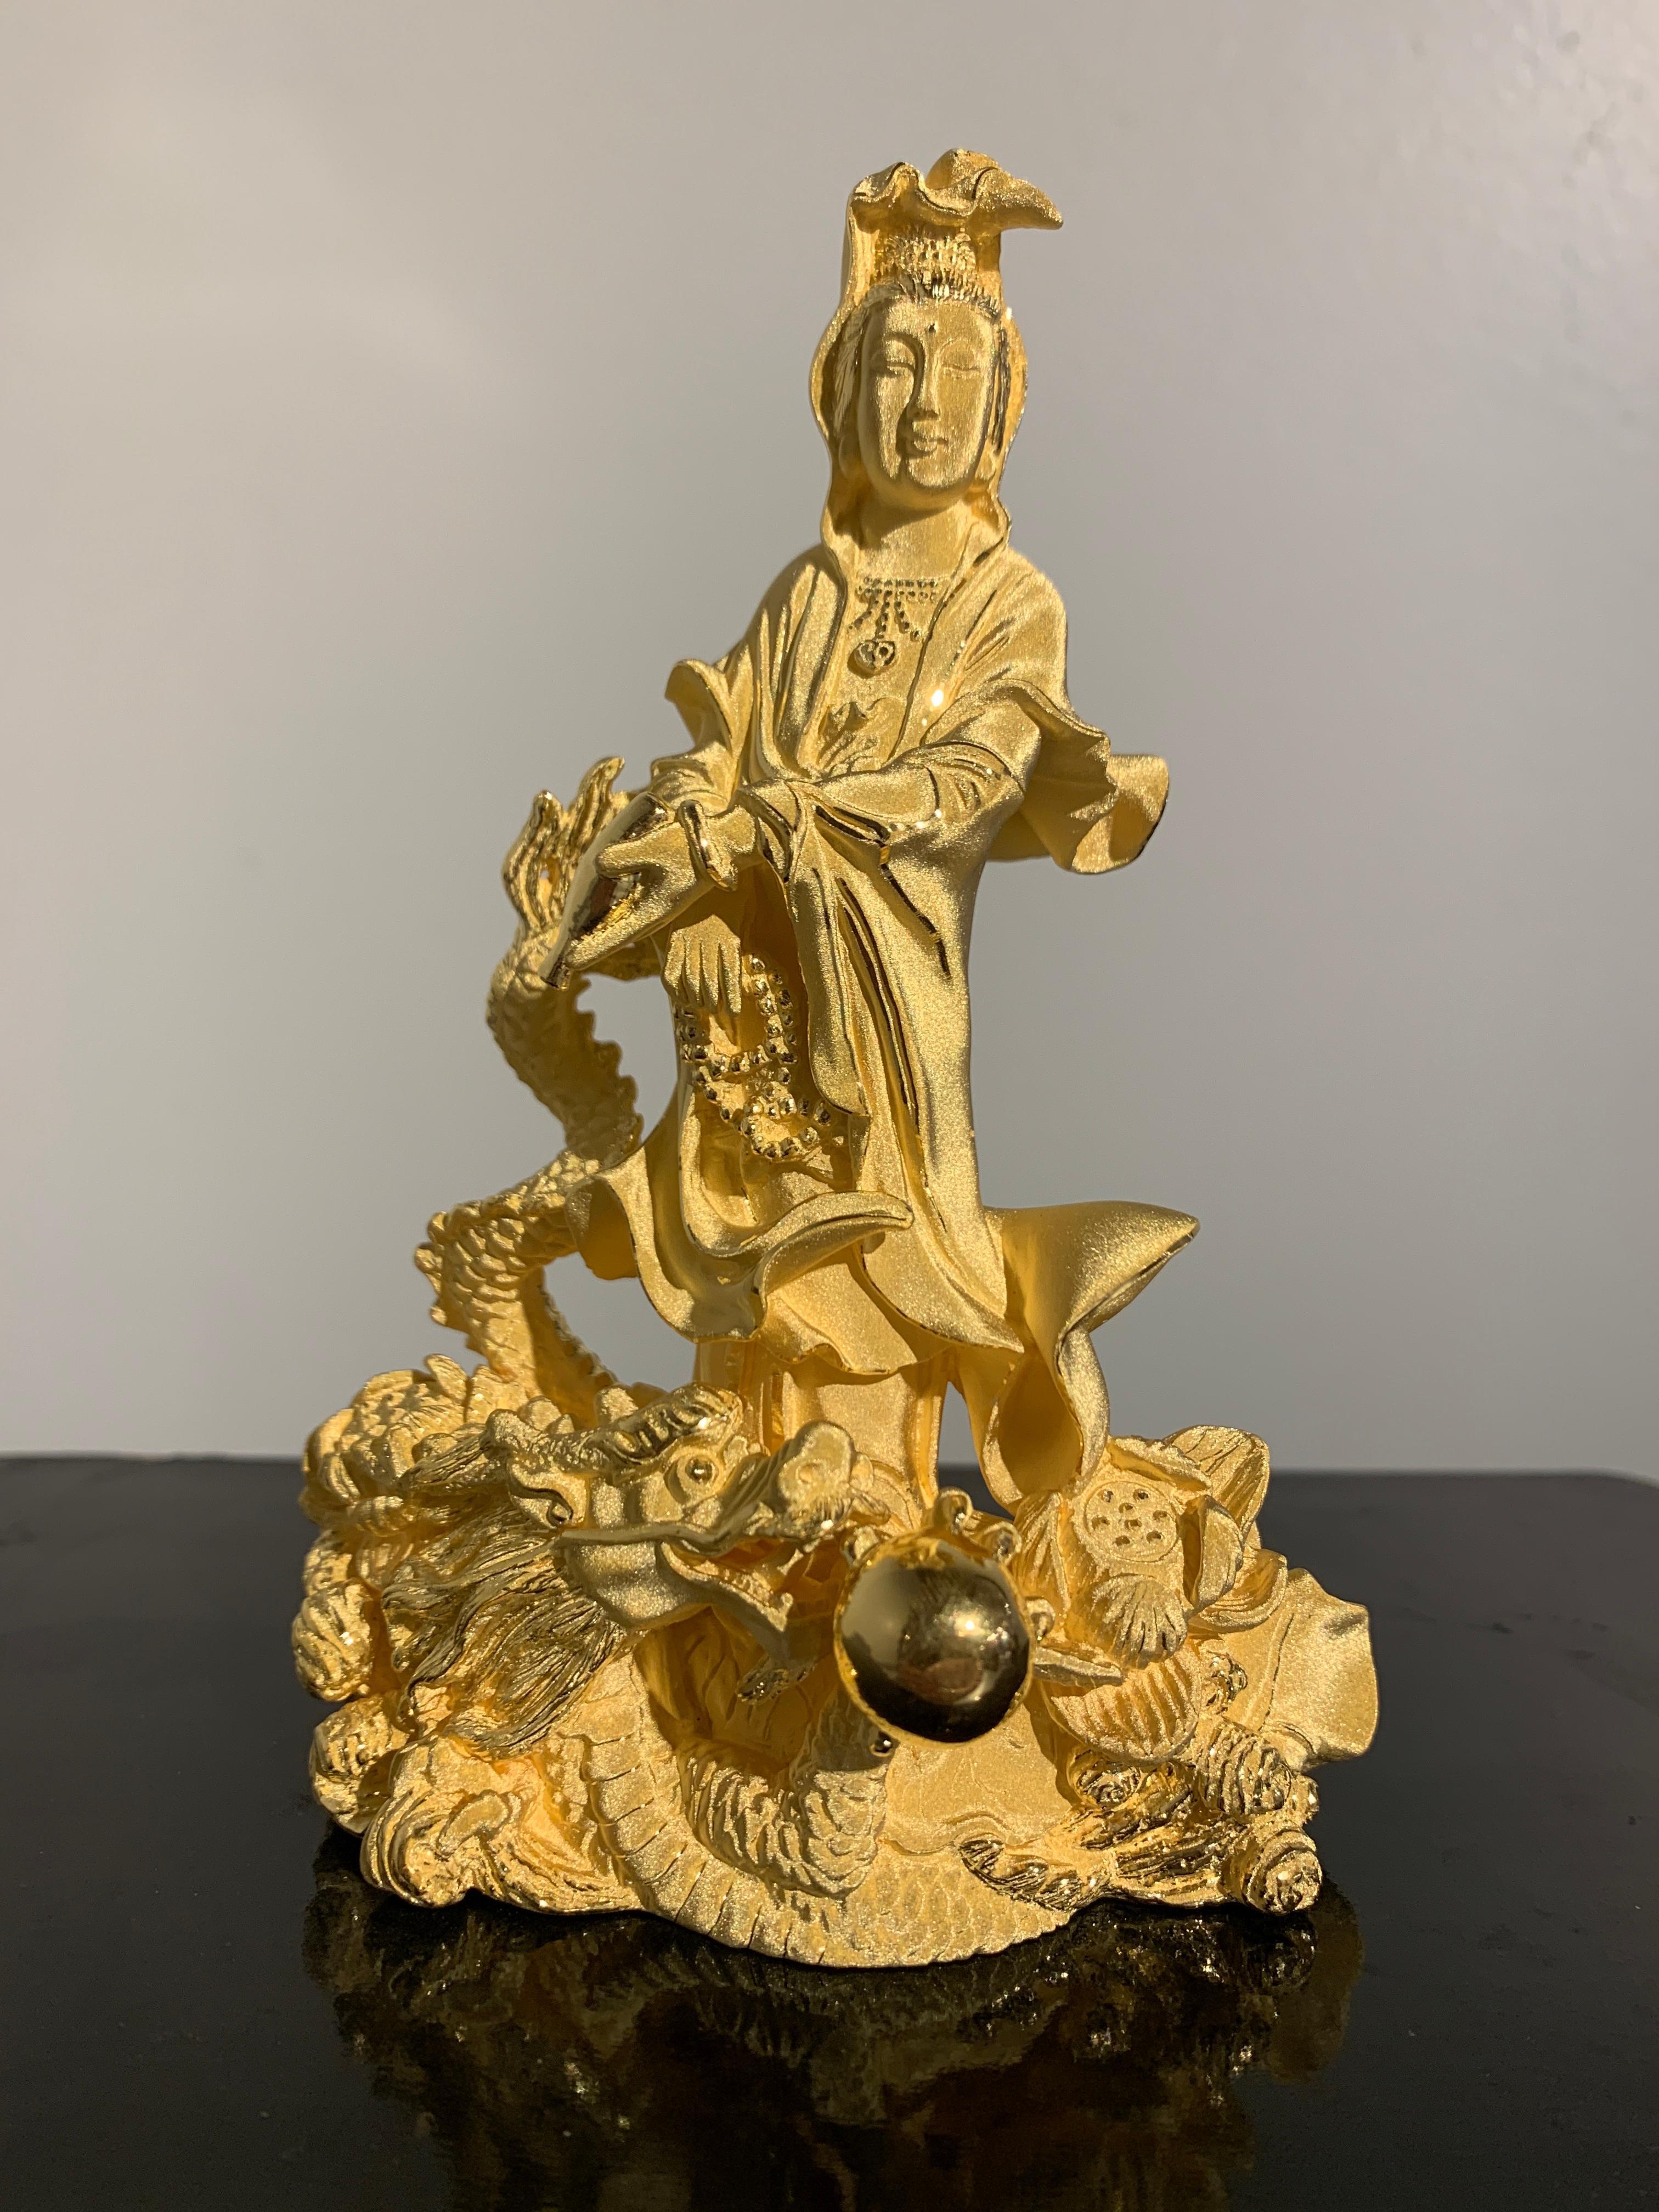 24 karat gold dragon jade ball statue lyka labs results for leukemia